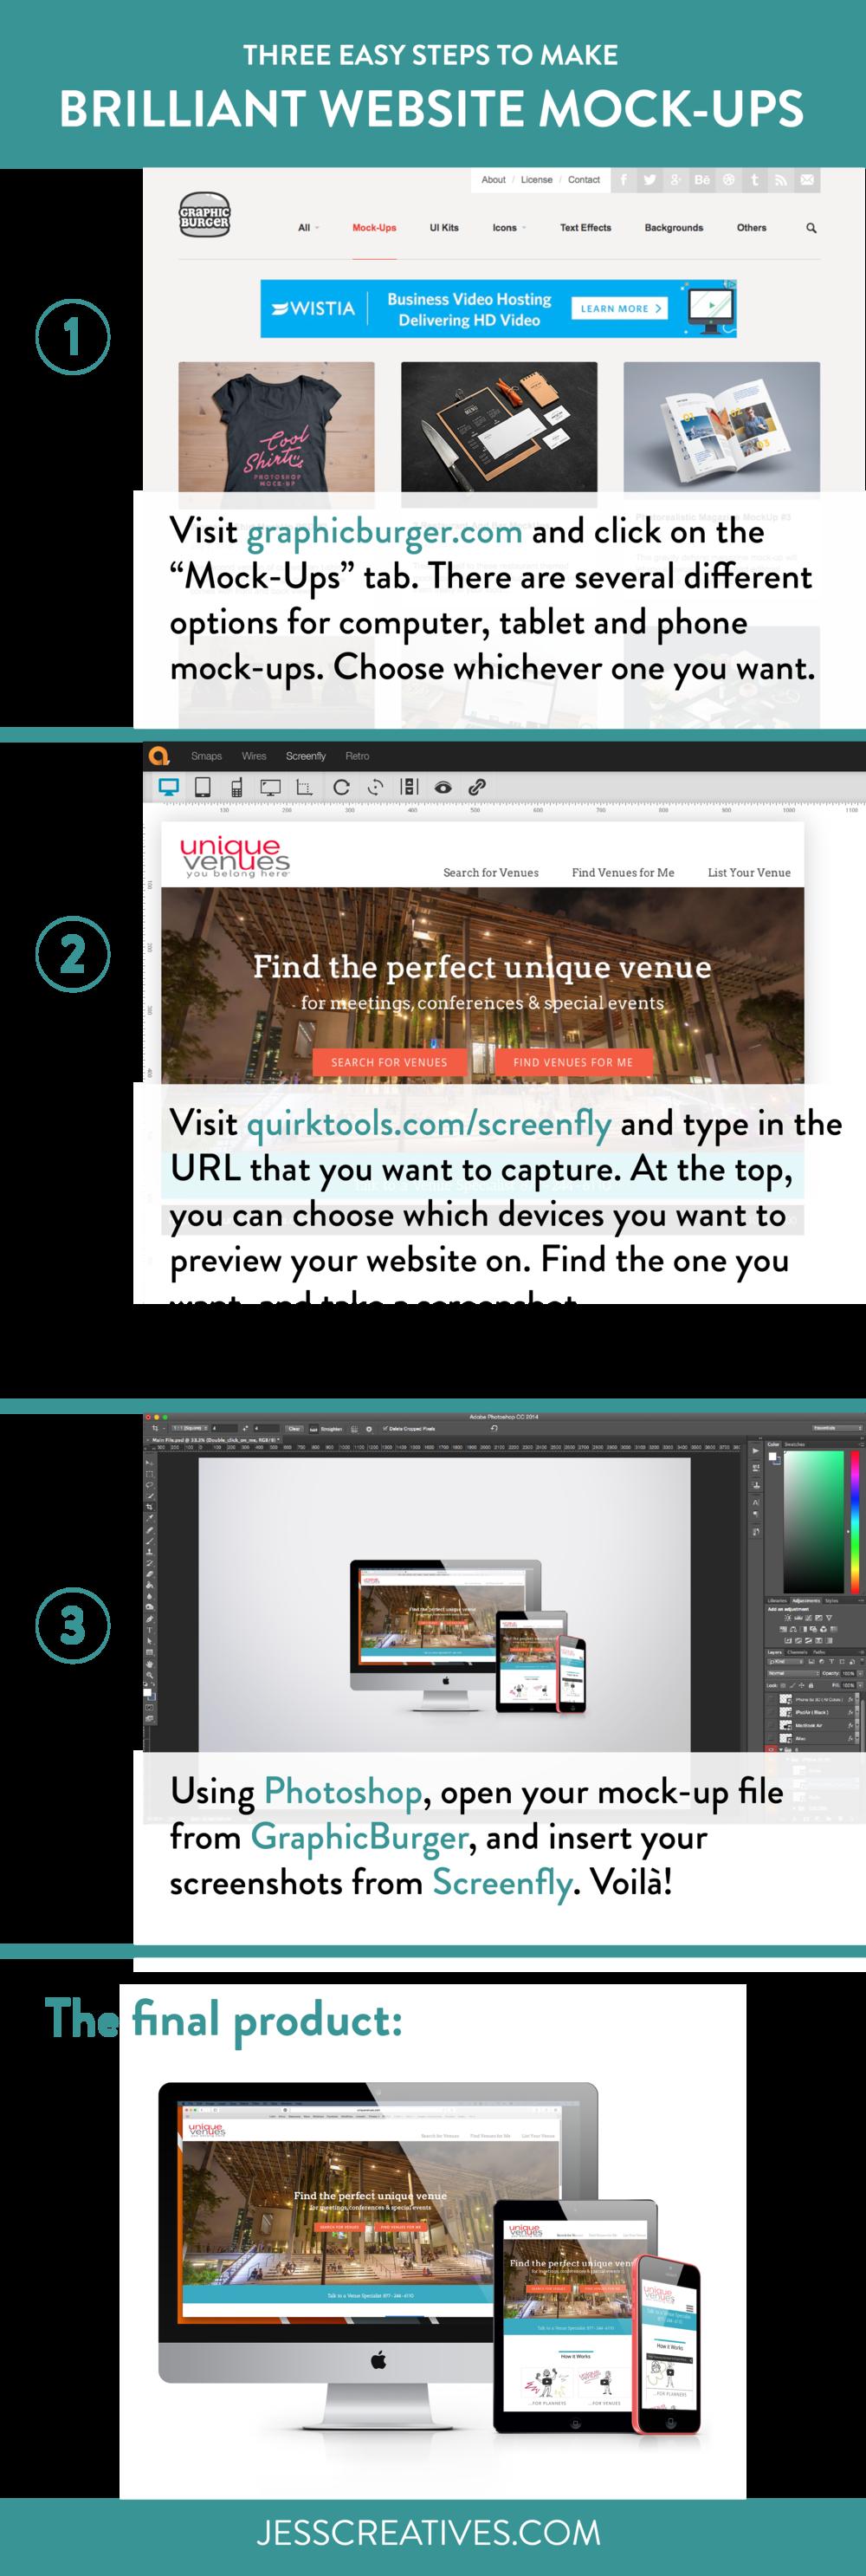 Three easy steps to brilliant website mock-ups